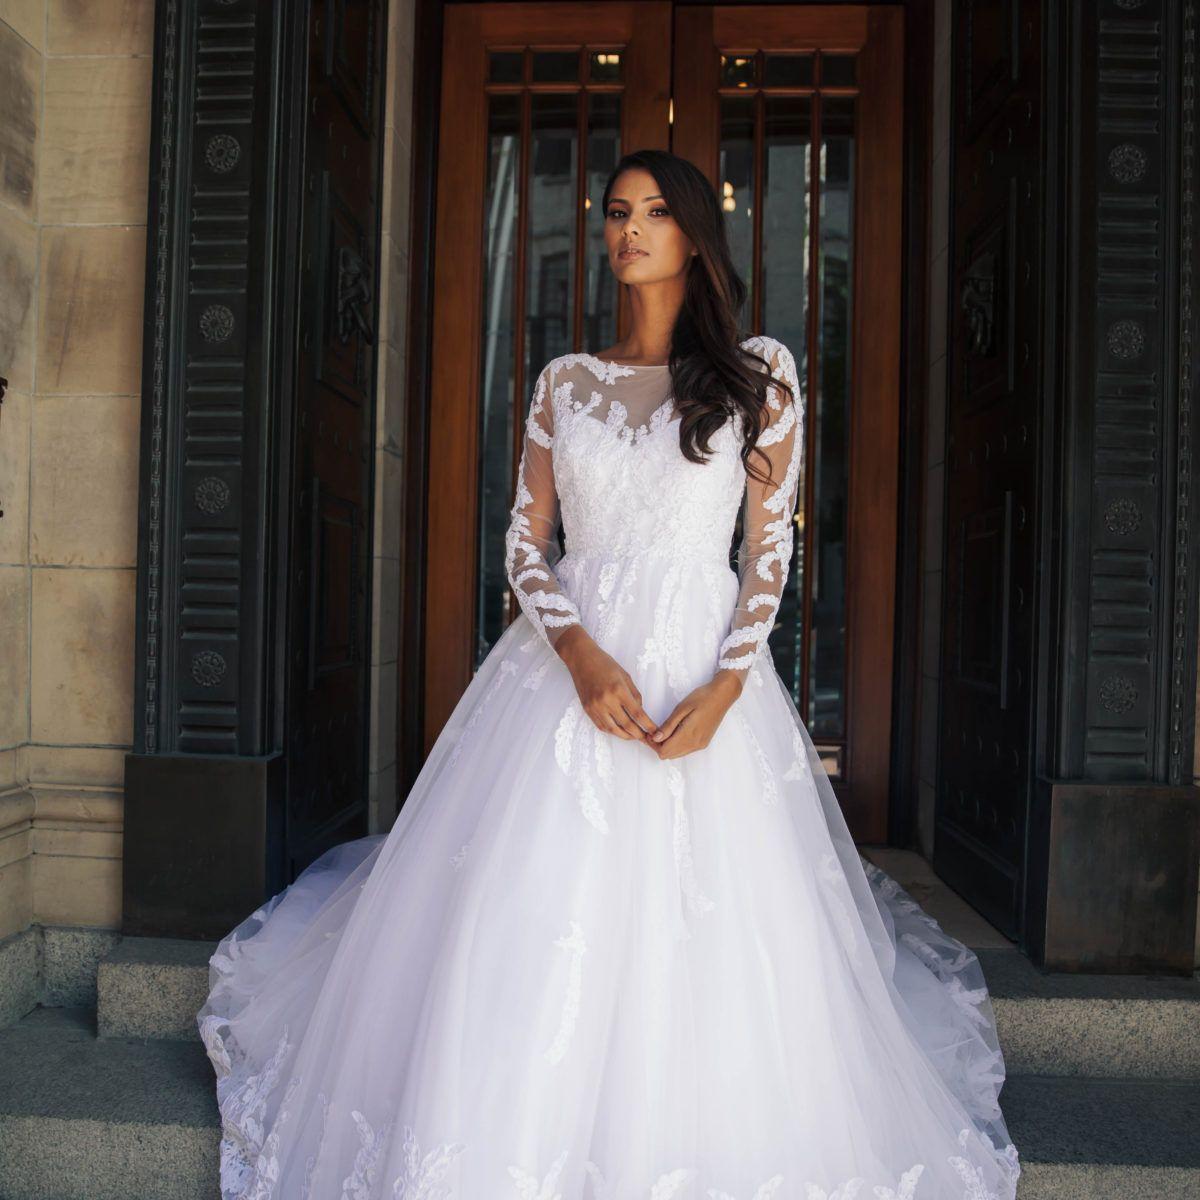 Tashreeqah Sadien Wedding Gowns Cape Town Pink Book Weddings Weddingdresses Dresses Wedding Gown Wedding Dresses Cape Wedding Dress Bespoke Wedding Dress